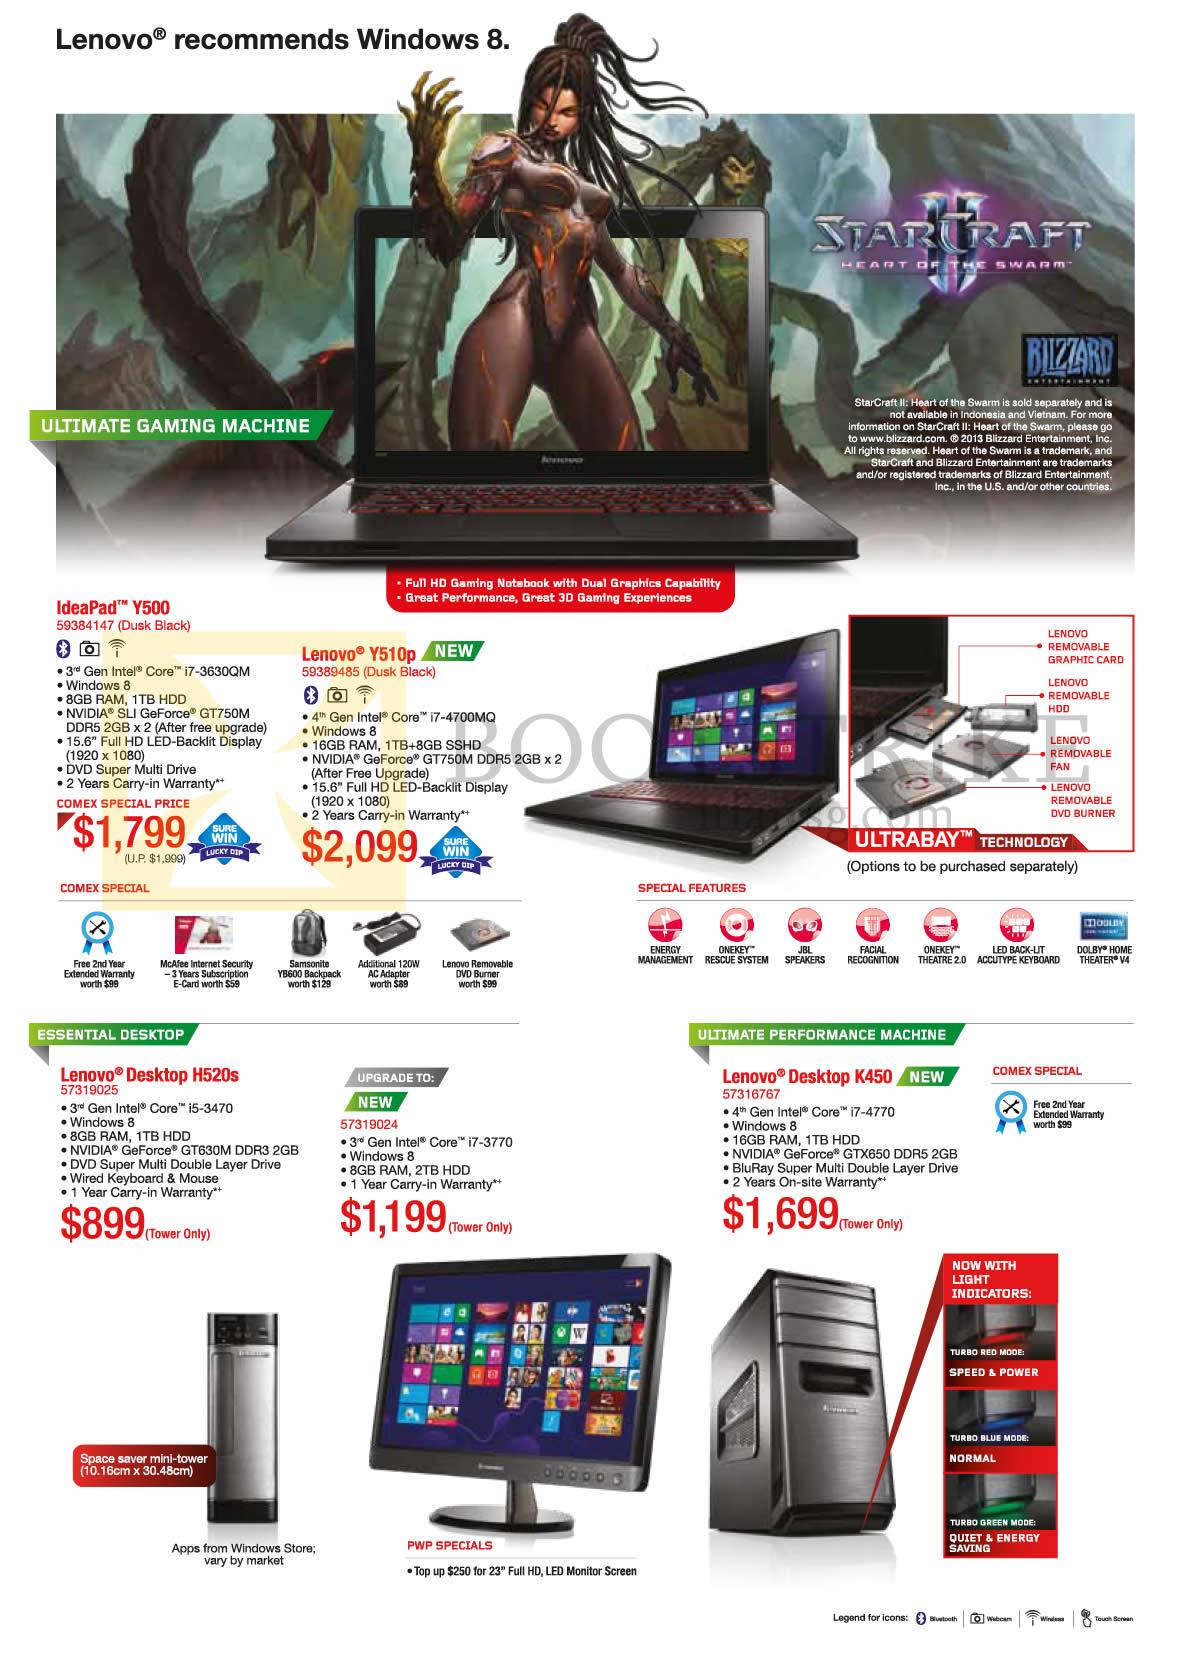 COMEX 2013 price list image brochure of Lenovo Notebooks Ideapad Y500, Y510p, Desktop PC H520s, K450